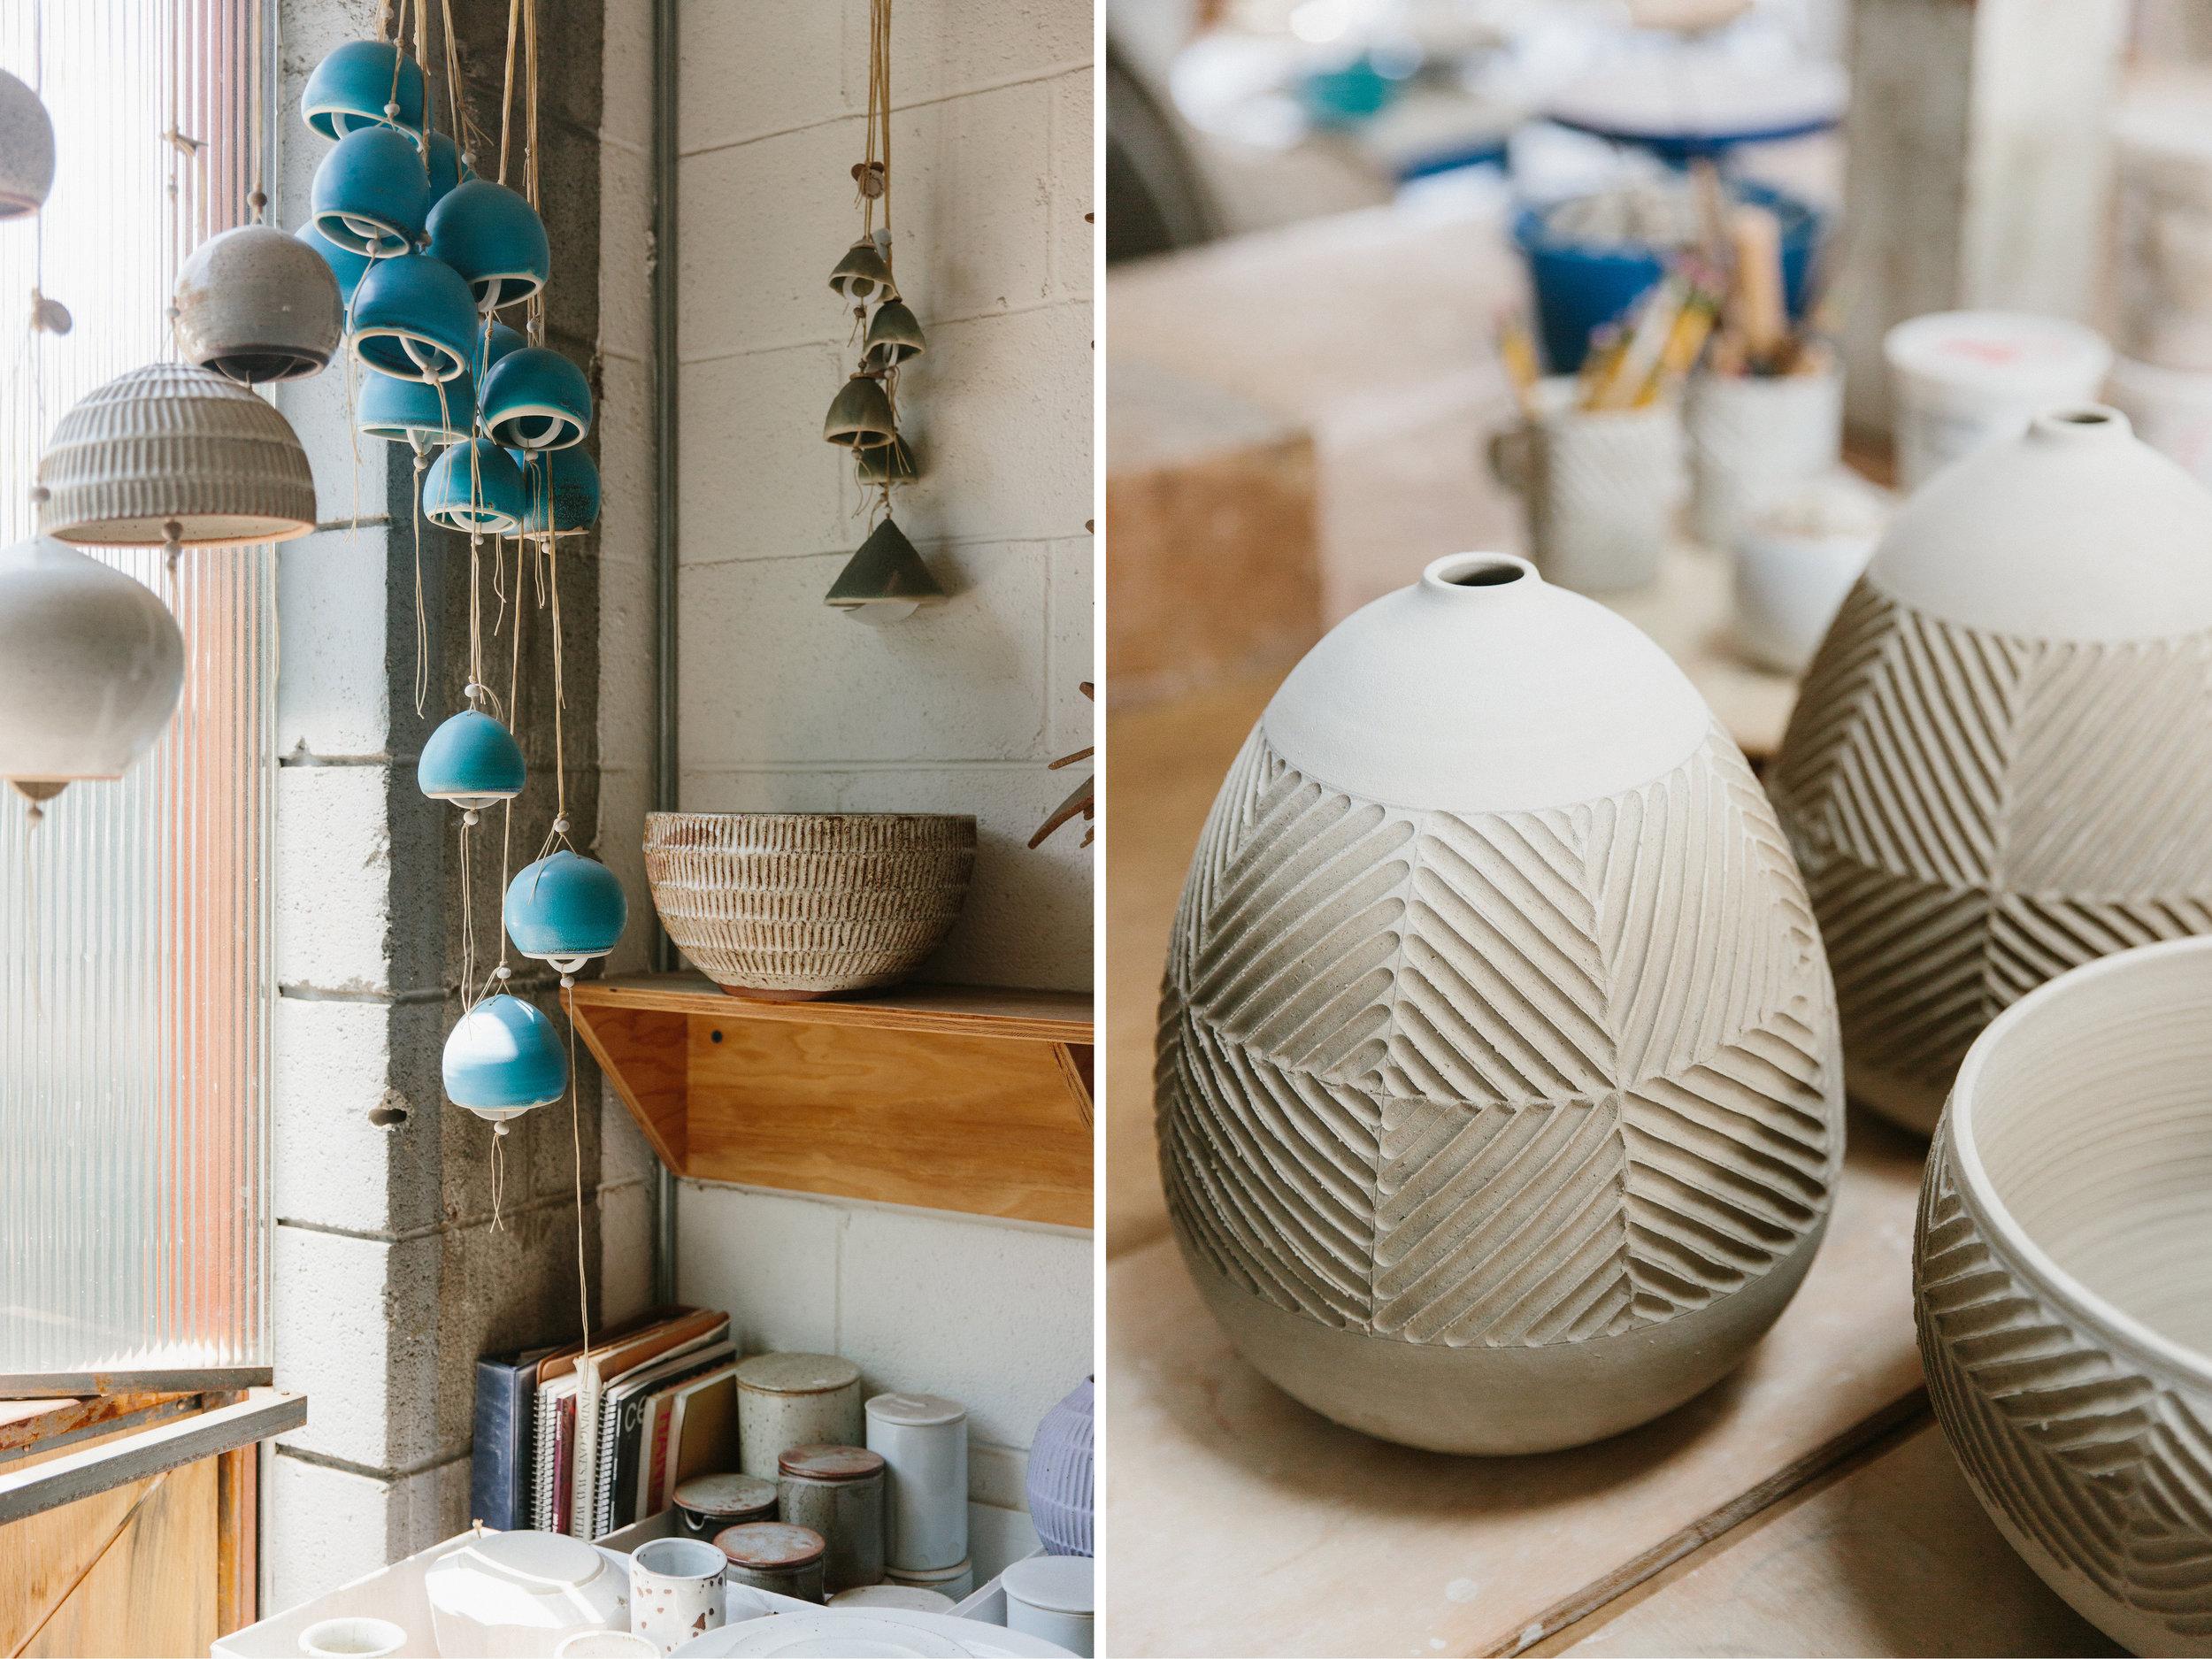 mt-washington-pottery_jenni-kayne_los-angeles-editorial-studio-home-tour_nicki-sebastian_1.jpg